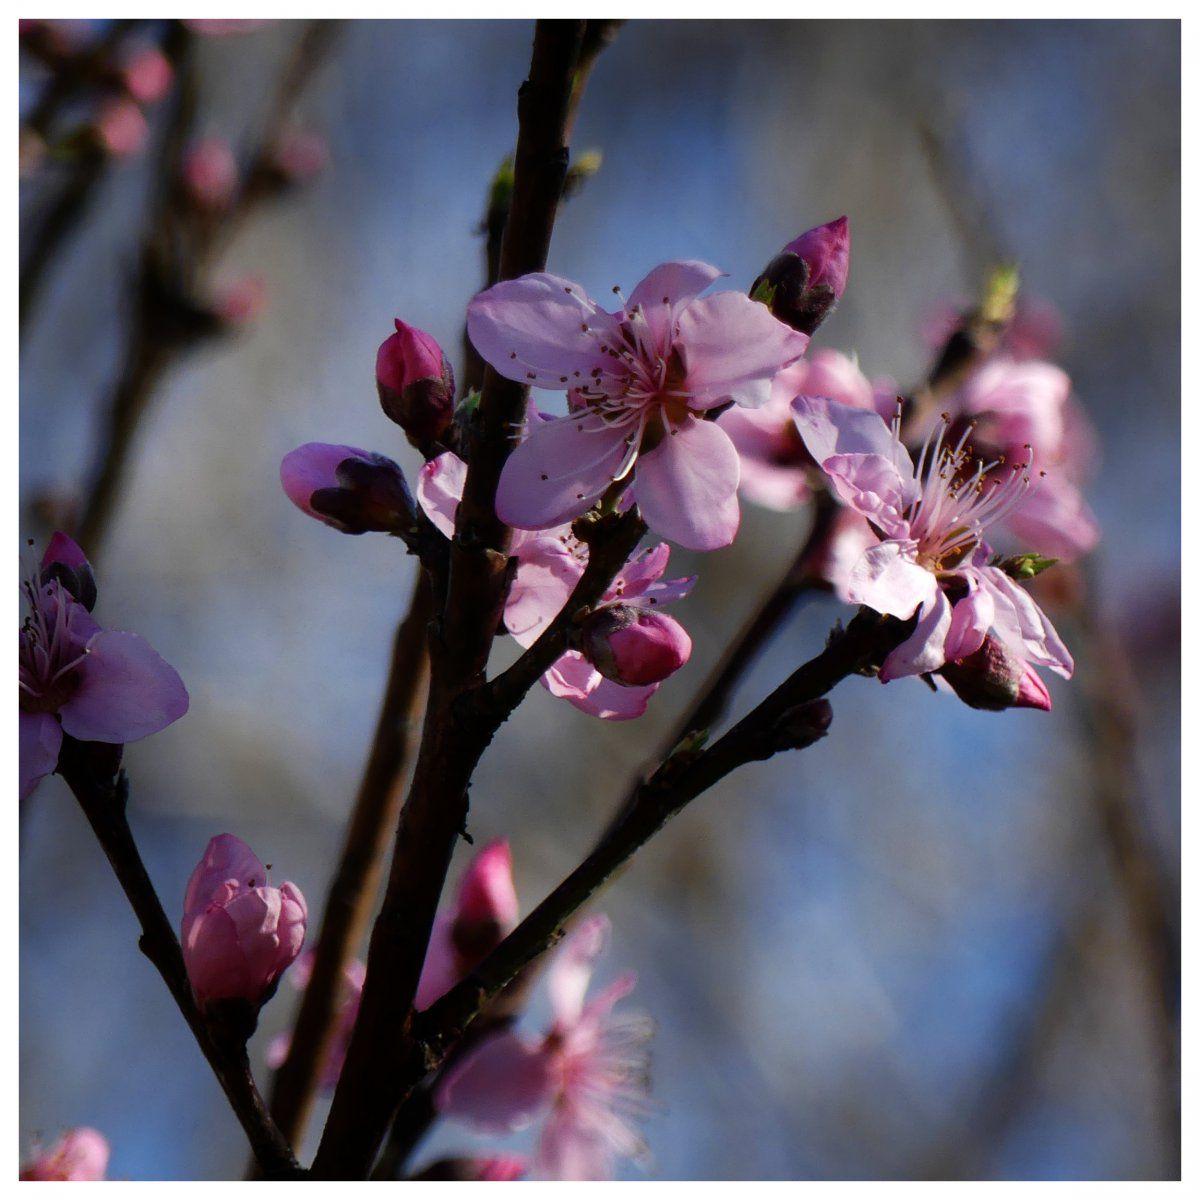 peach_blossom_2.jpg